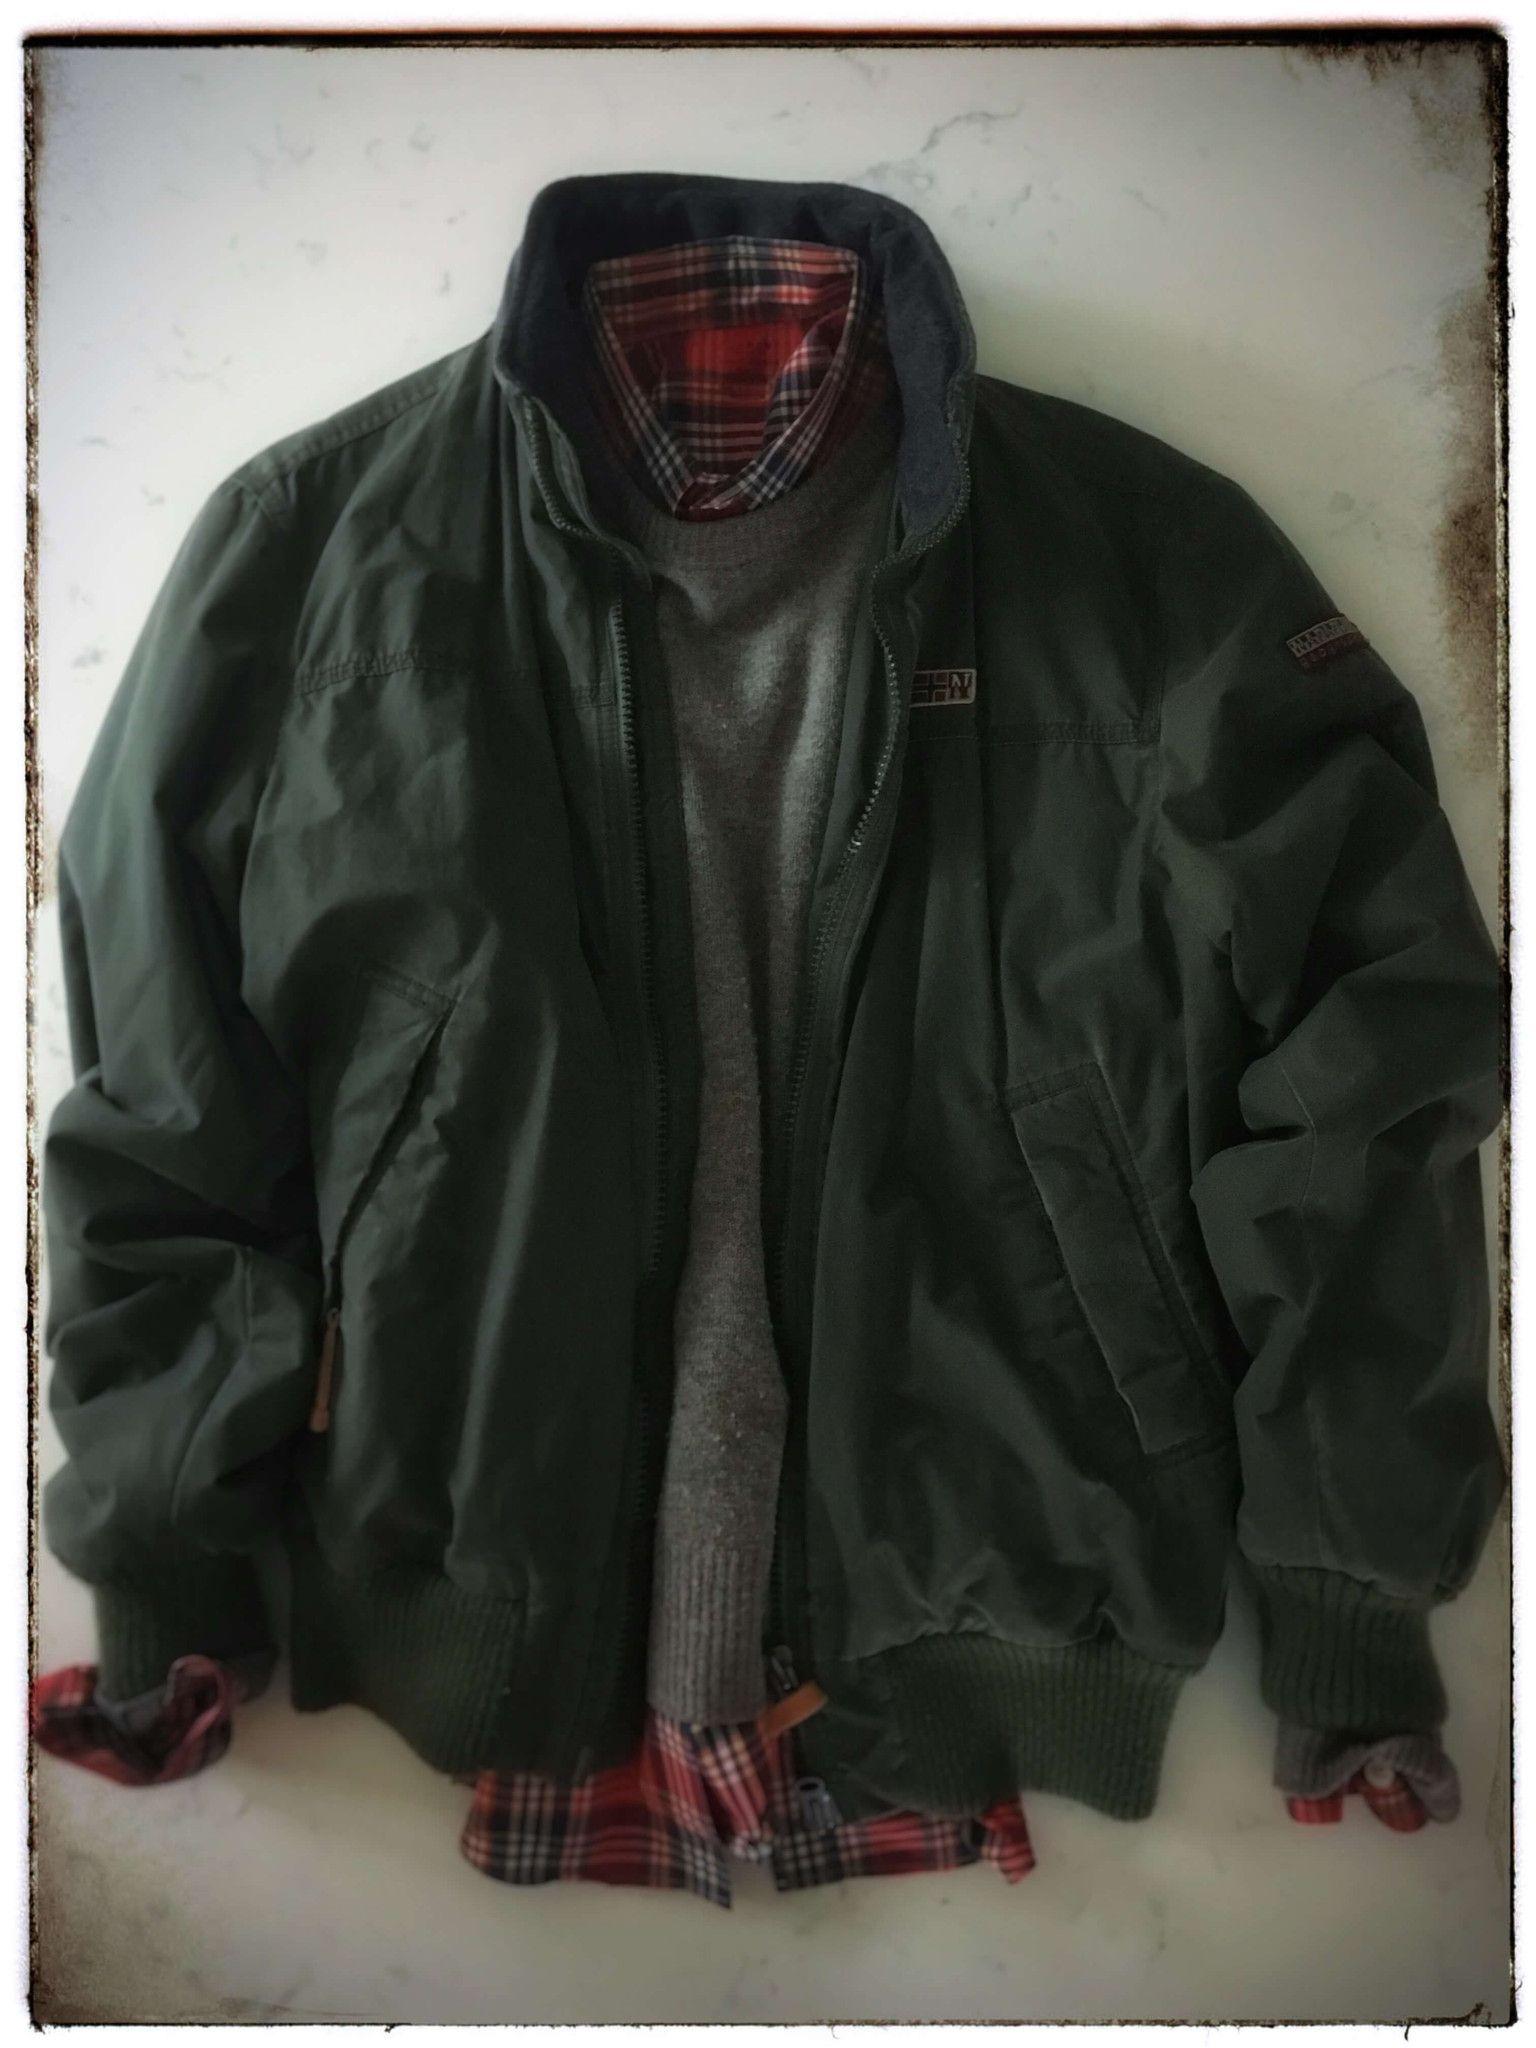 Menus vintage napapijri bomber jacket with fleece lining size